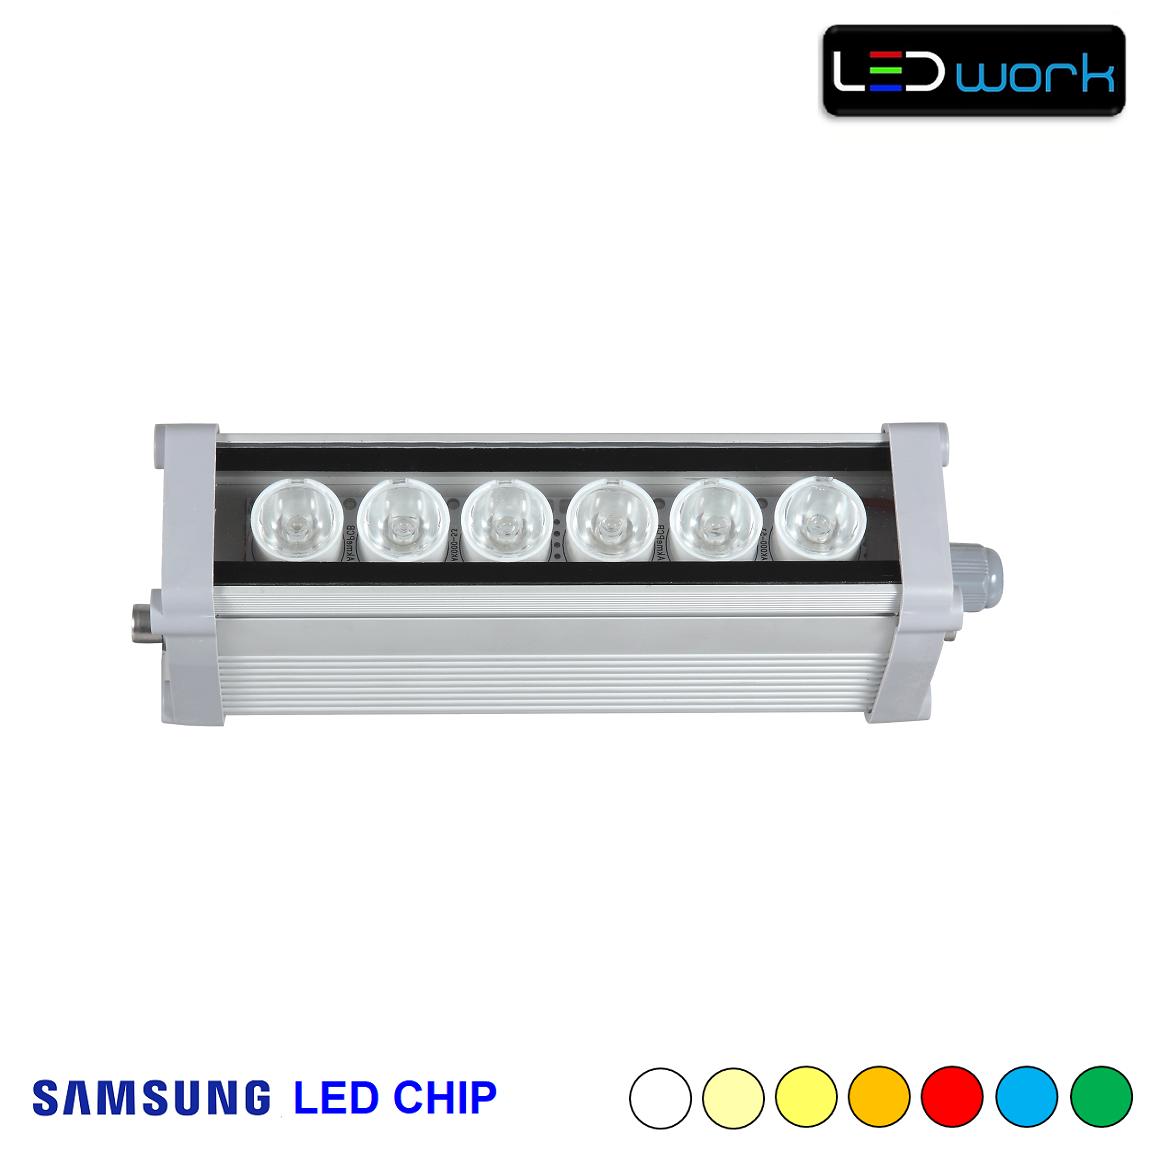 20 cm 6 Watt SAMSUNG LED Chip Sıva Üstü Wallwasher